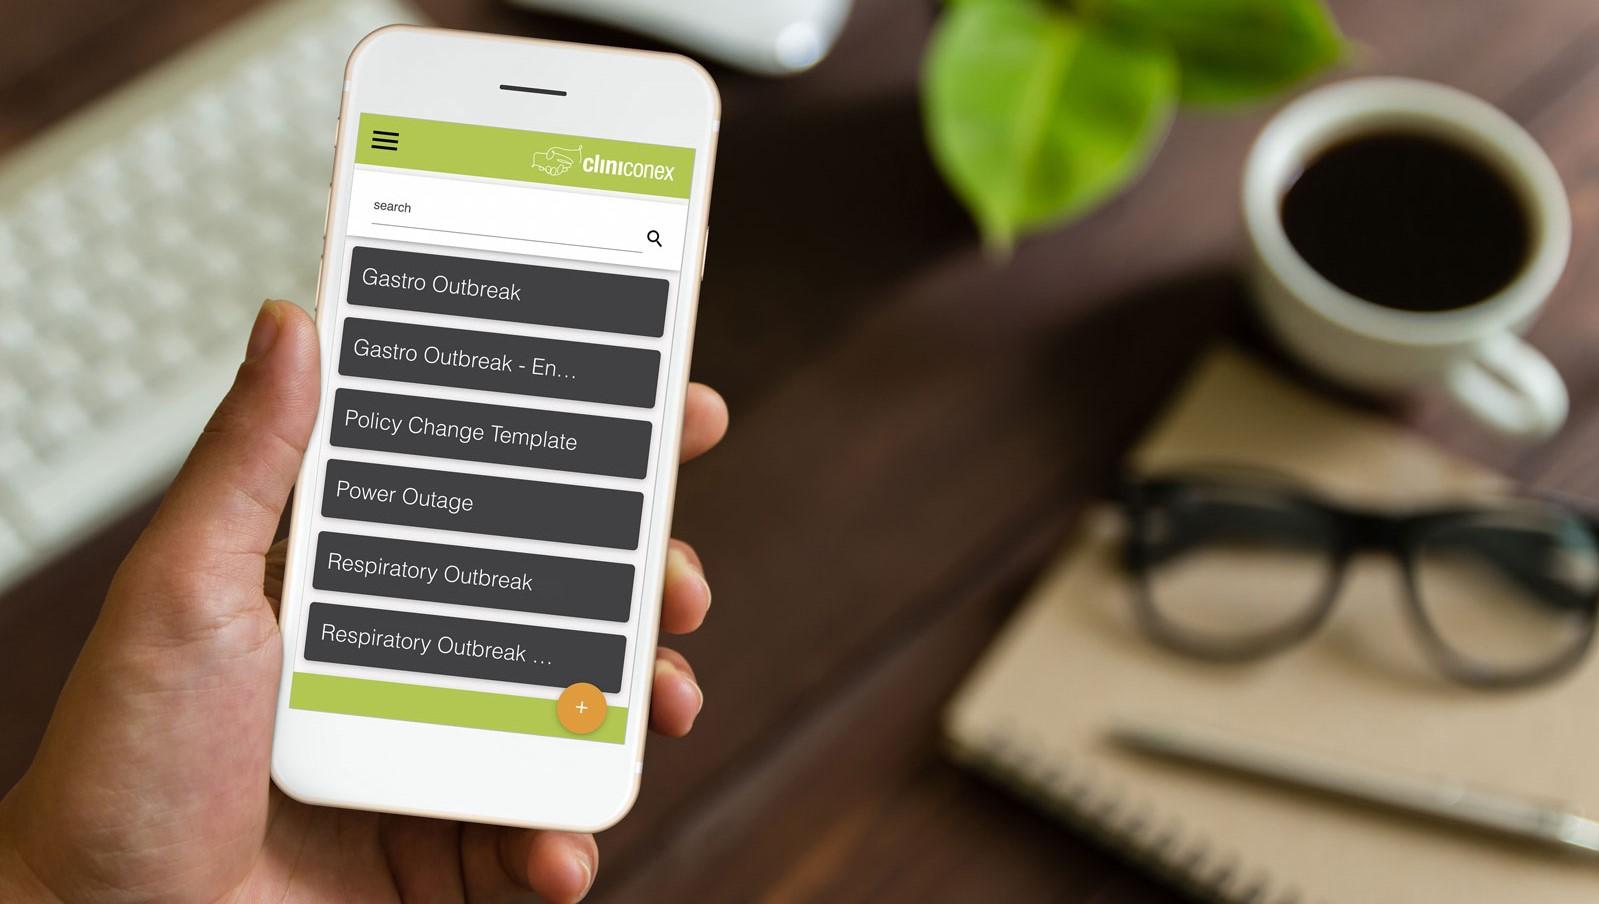 Cliniconex App